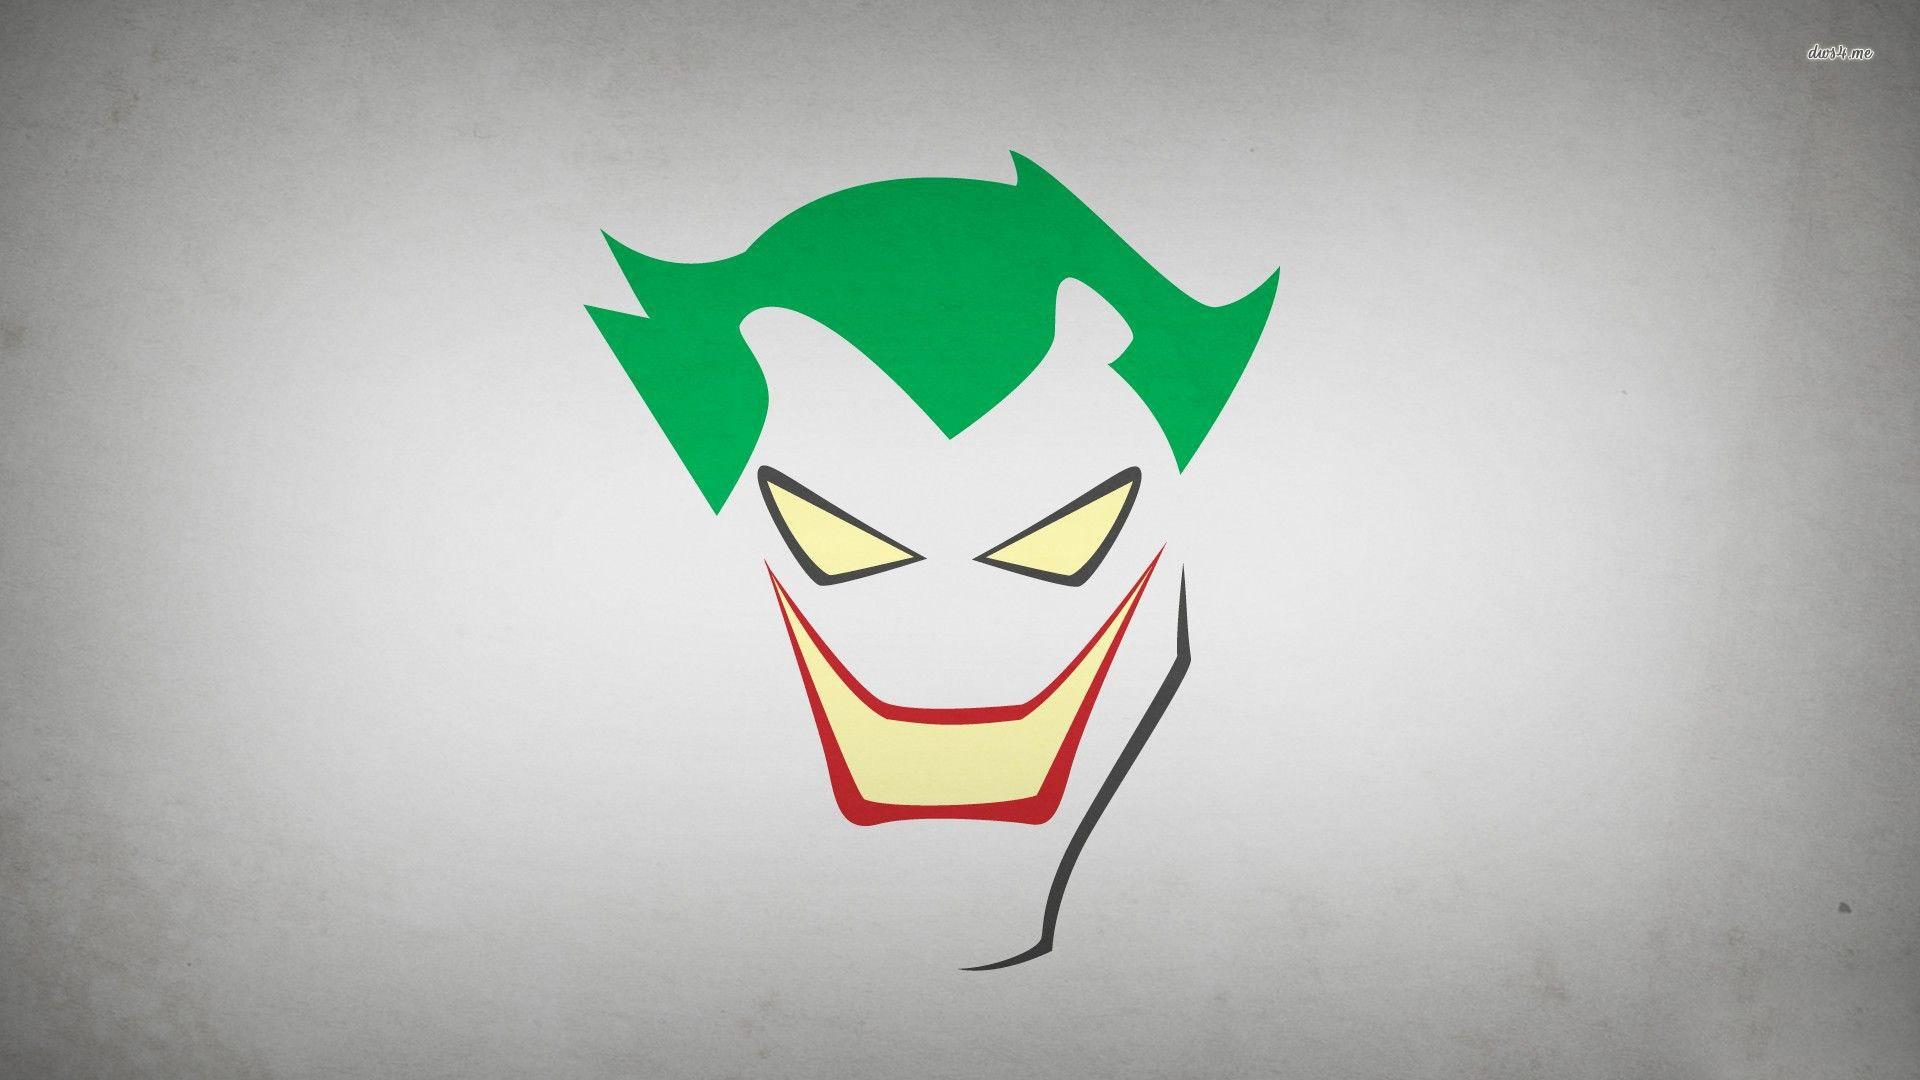 The Joker Minimalist Art HD Desktop Wallpaper Background 1920x1080